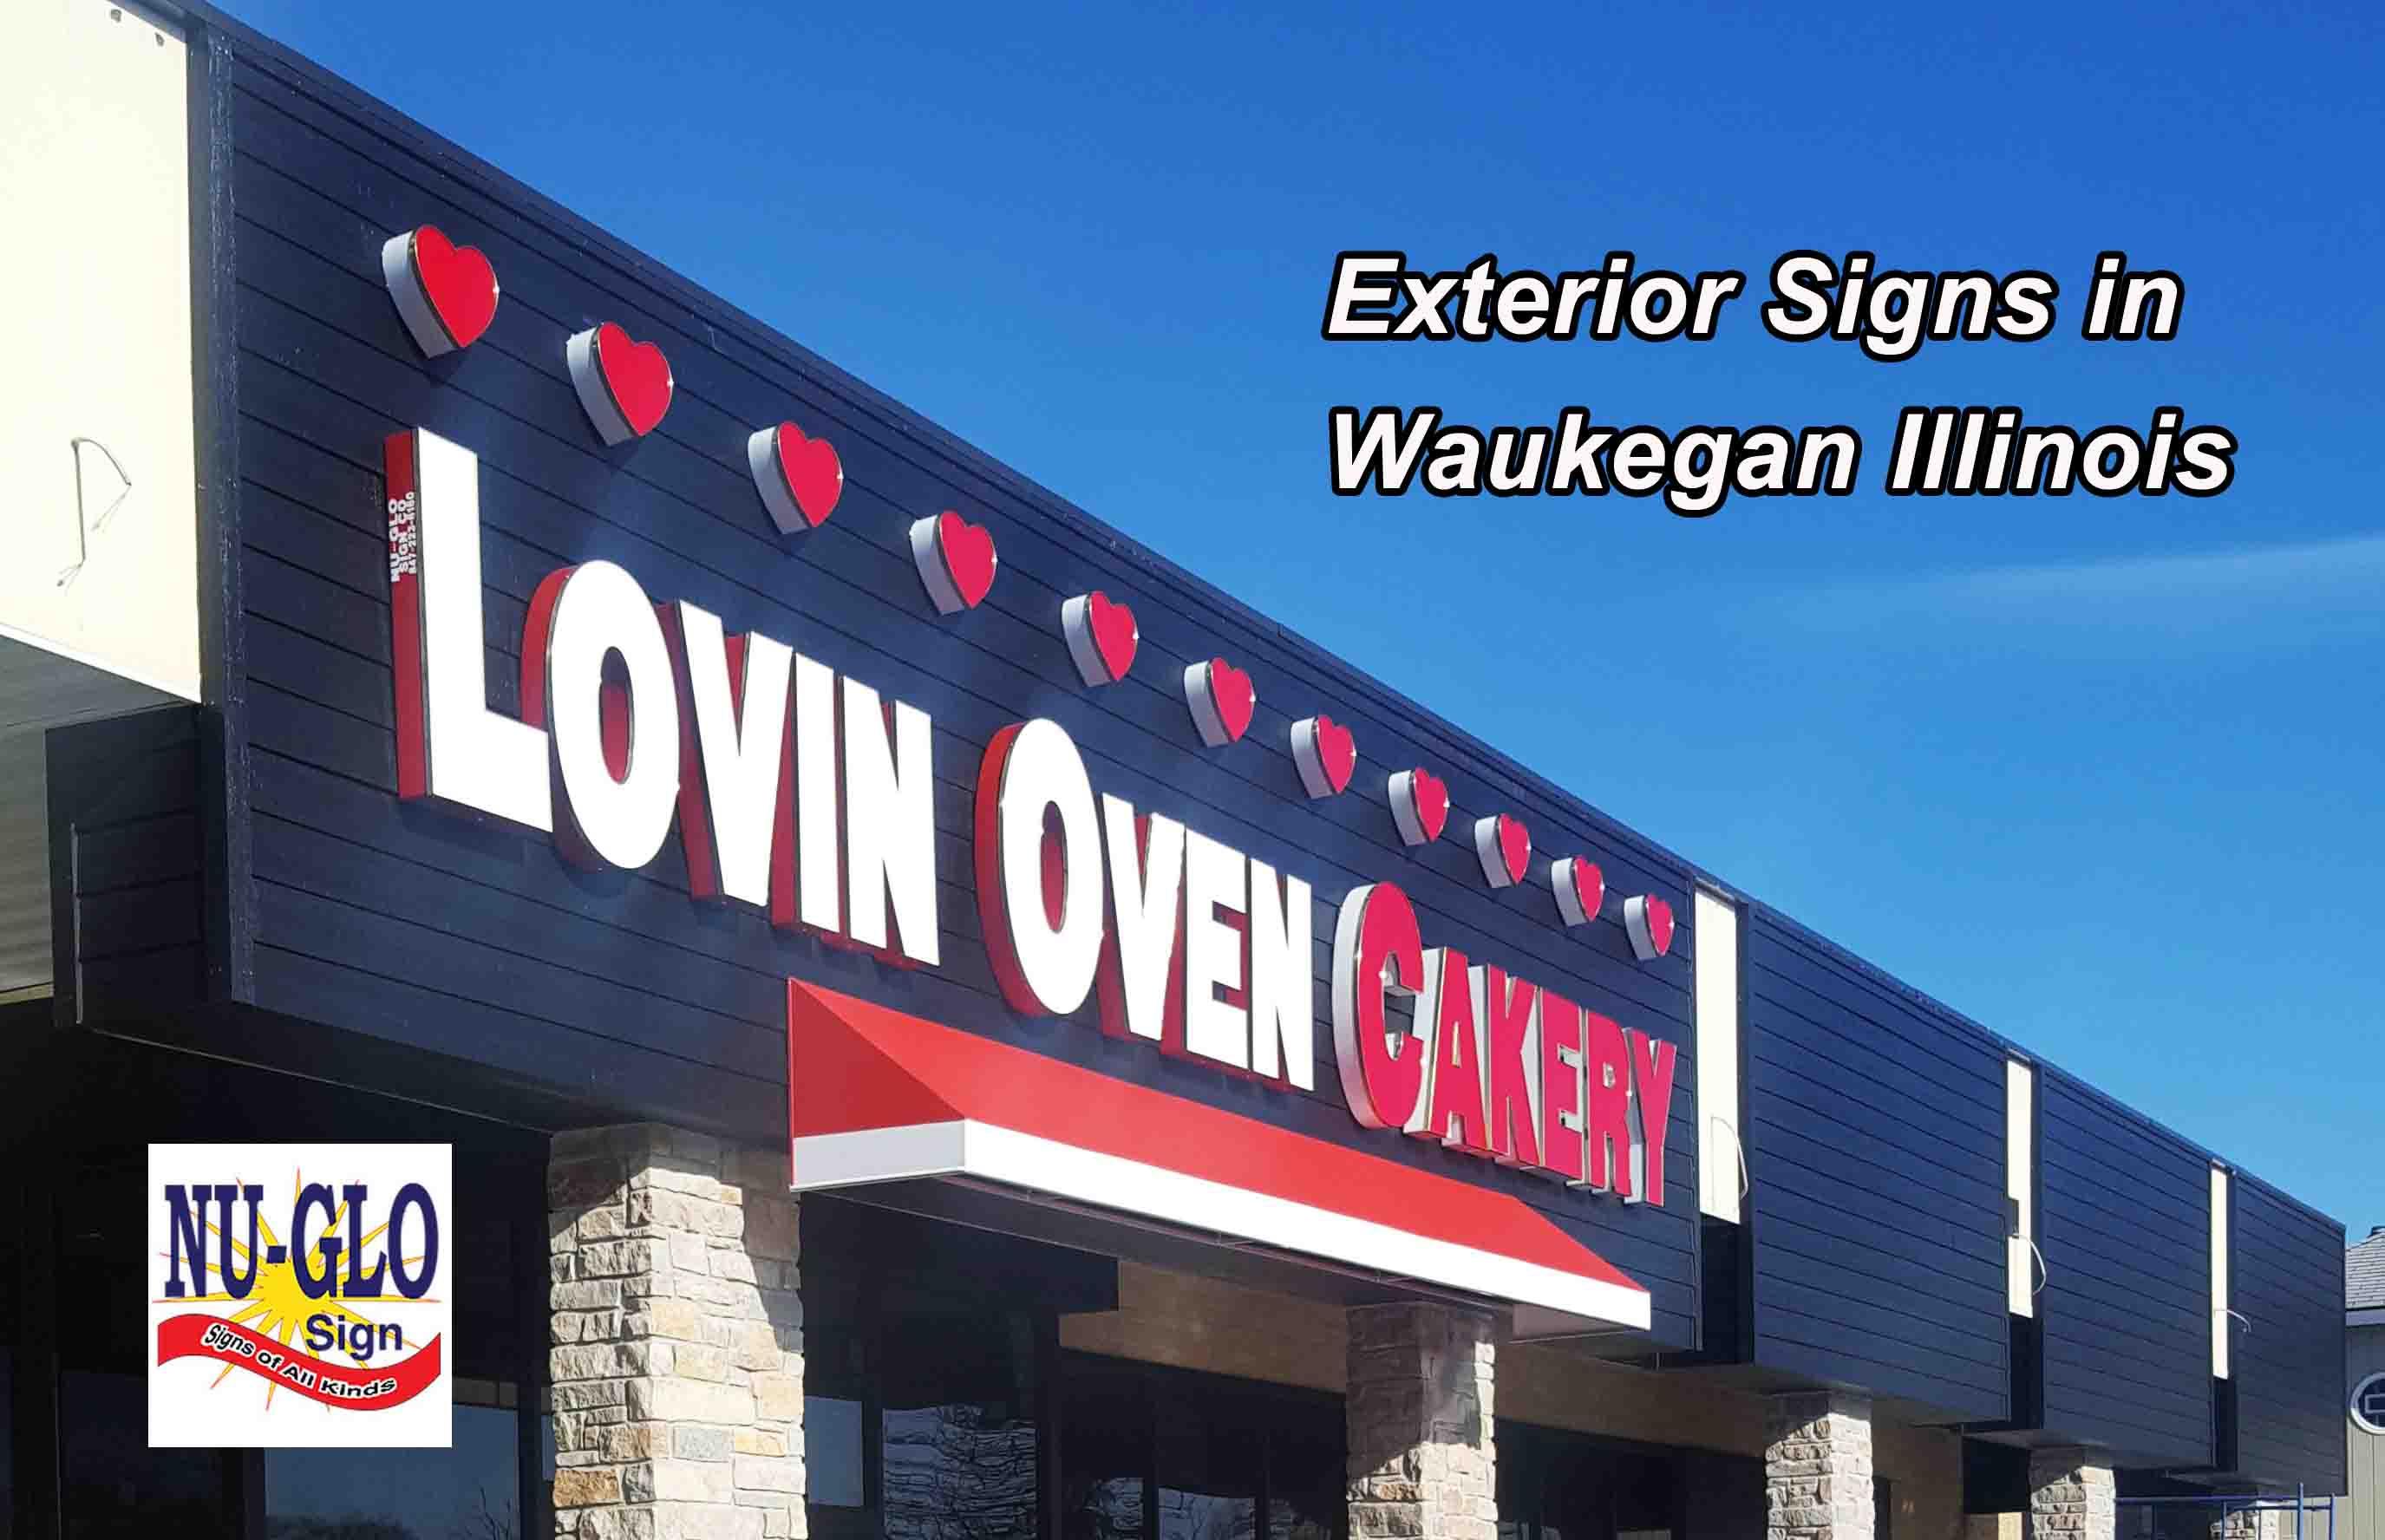 Exterior Signs in Waukegan Illinois